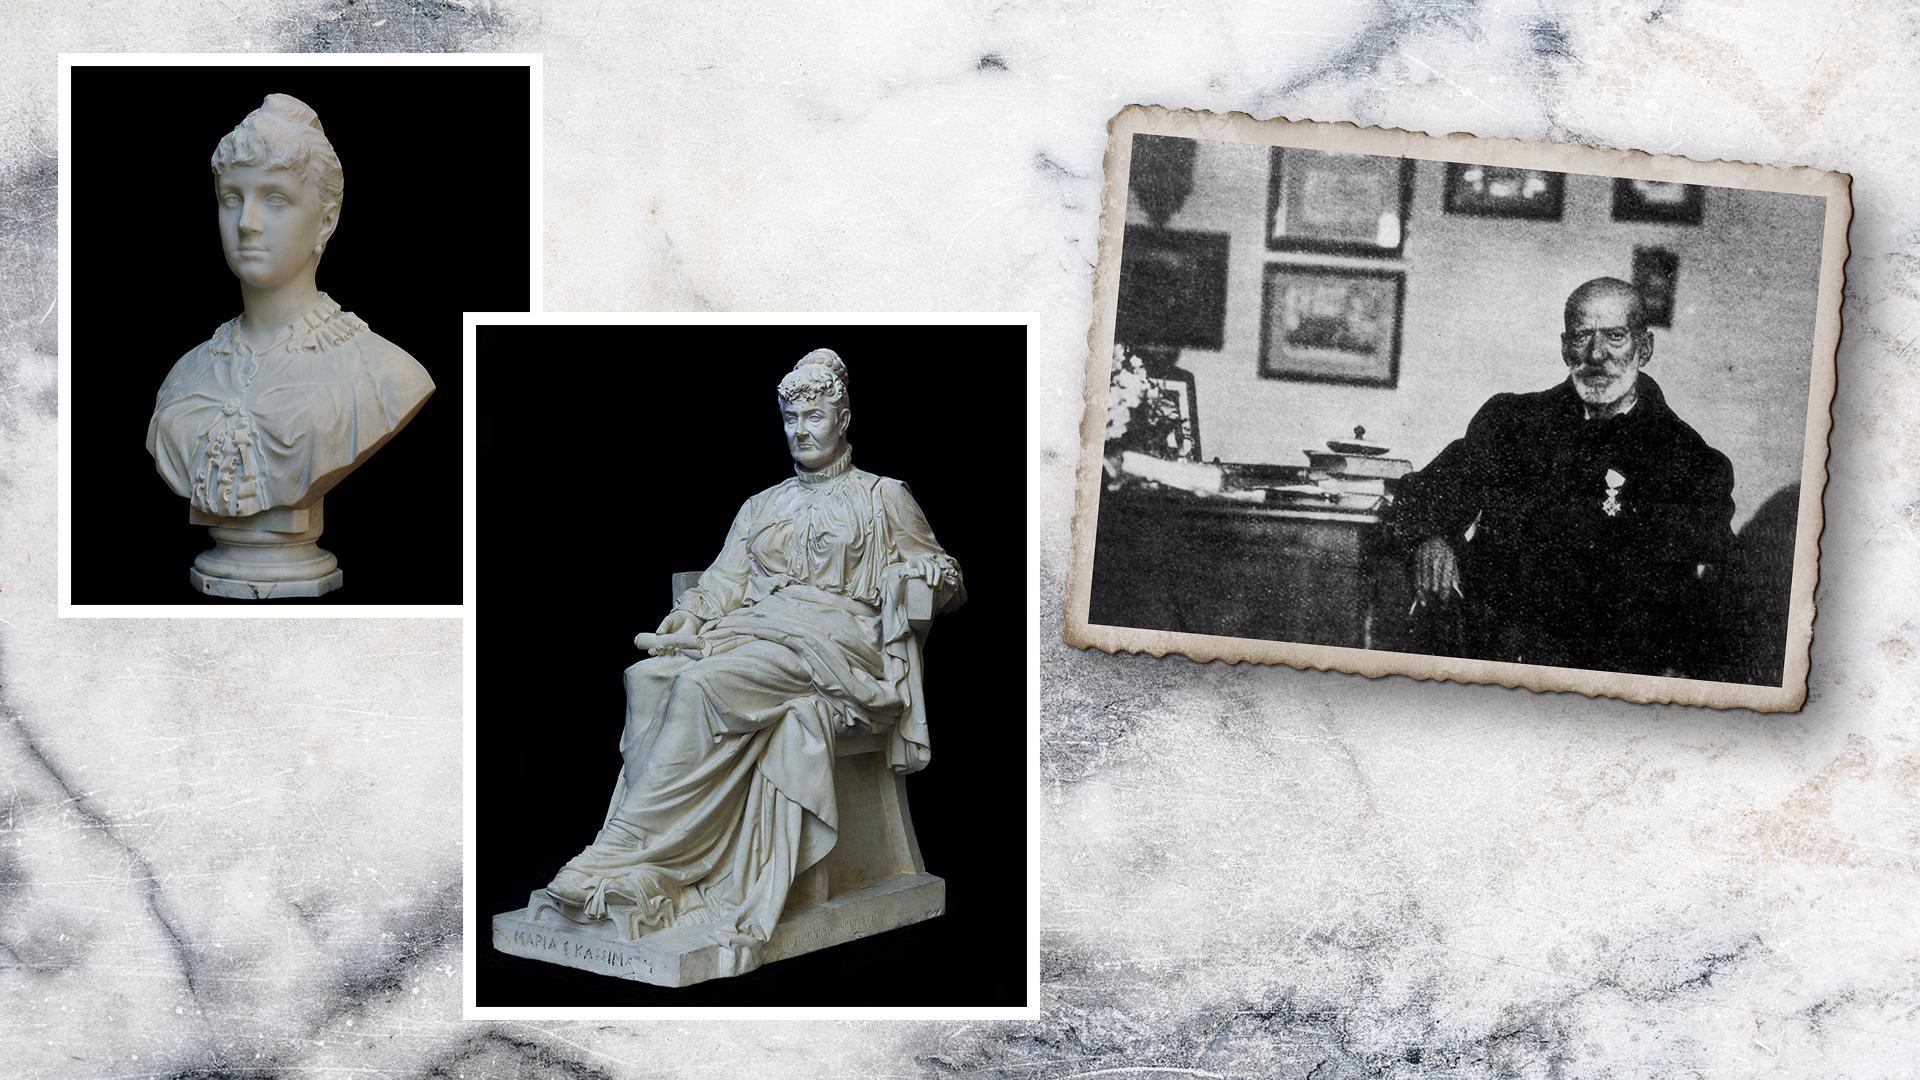 38770d584 Εγκαίνια της έκθεσης «Δημήτριος Φιλιππότης Τήνιος εποίει» στο Μουσείο  Μαρμαροτεχνίας